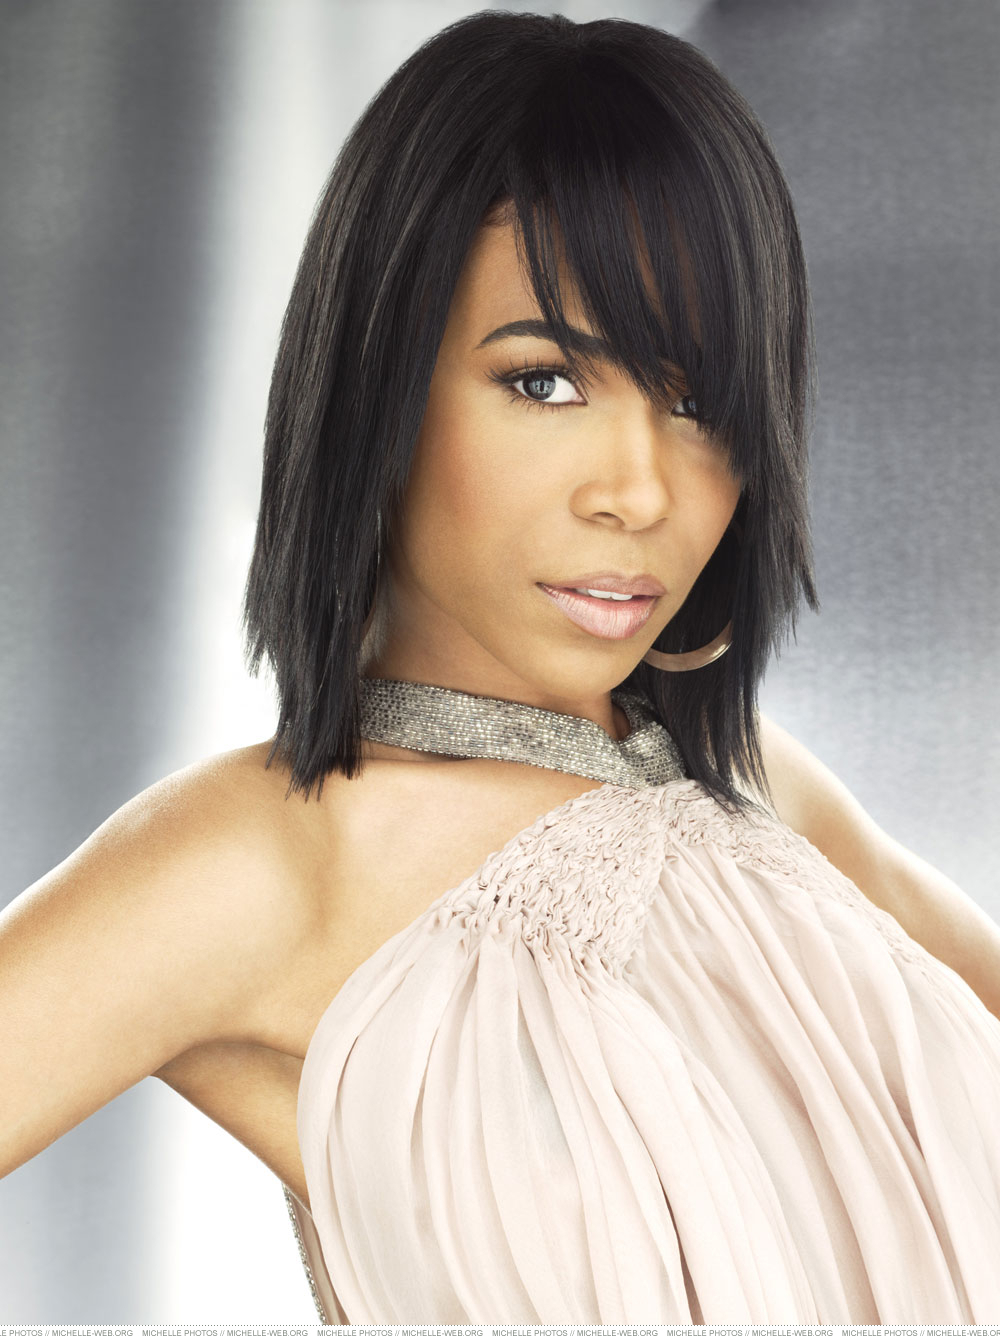 Michelle - Michelle Wi... Michelle Williams Singer